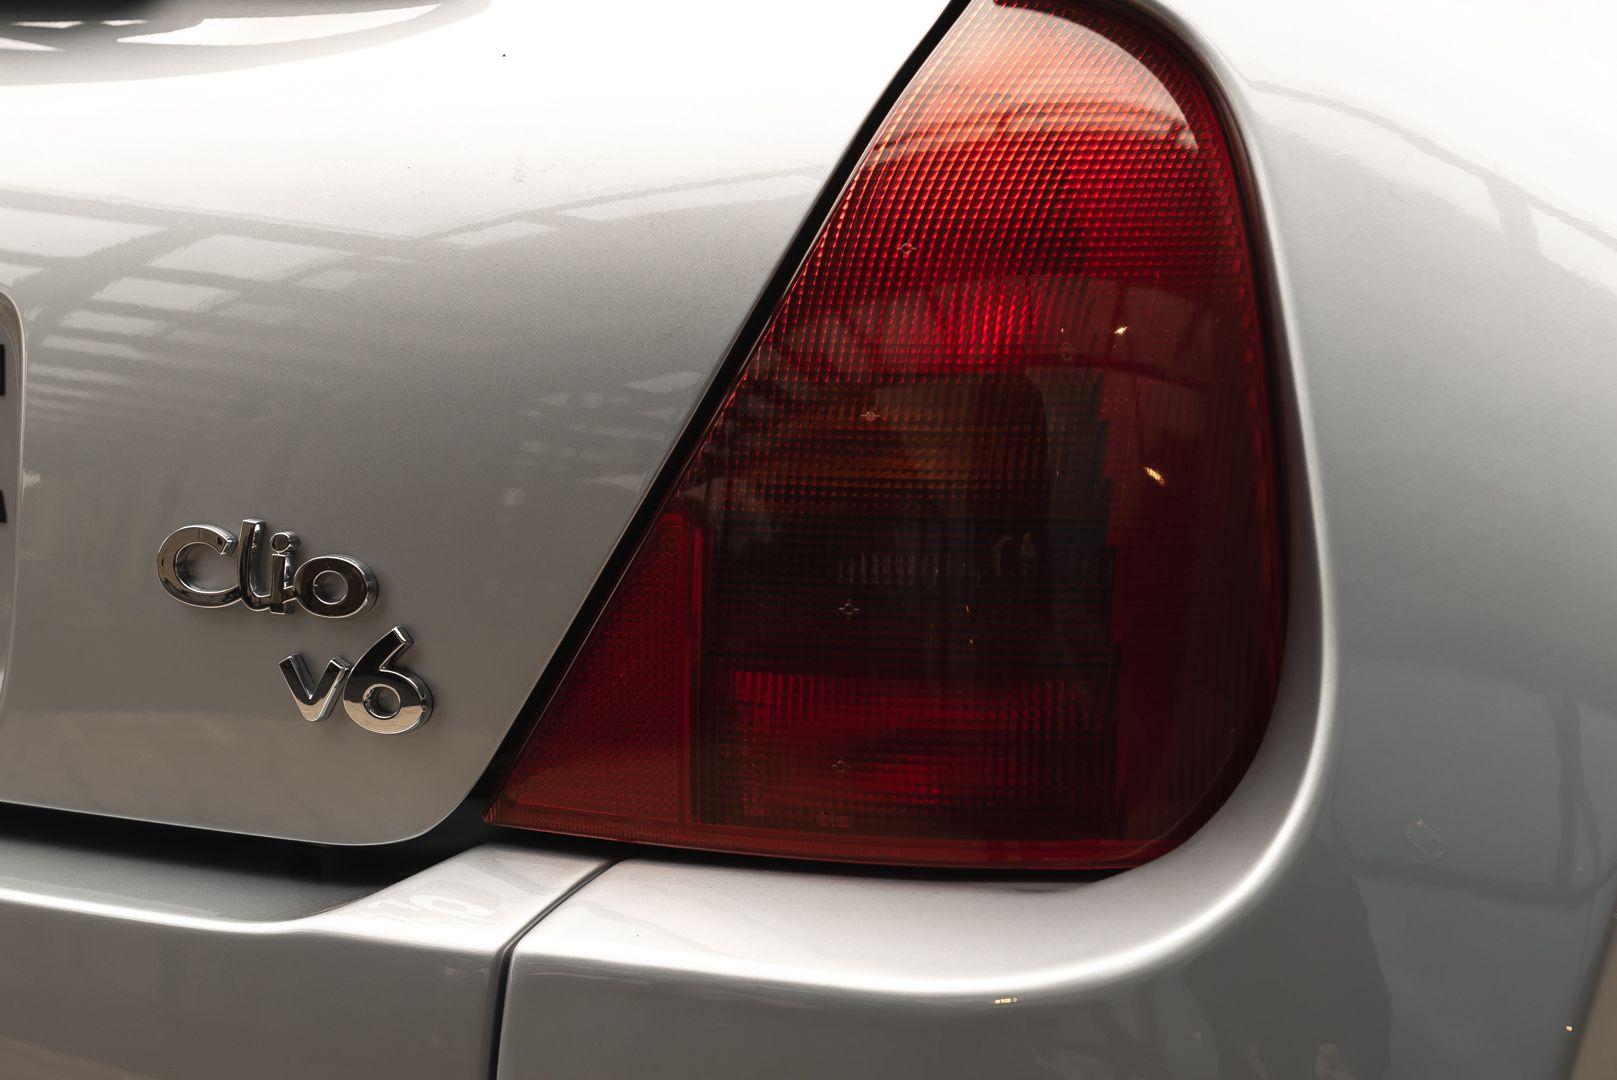 2002 Renault Clio 3.0 V6 Renault Sport Phase1 84932